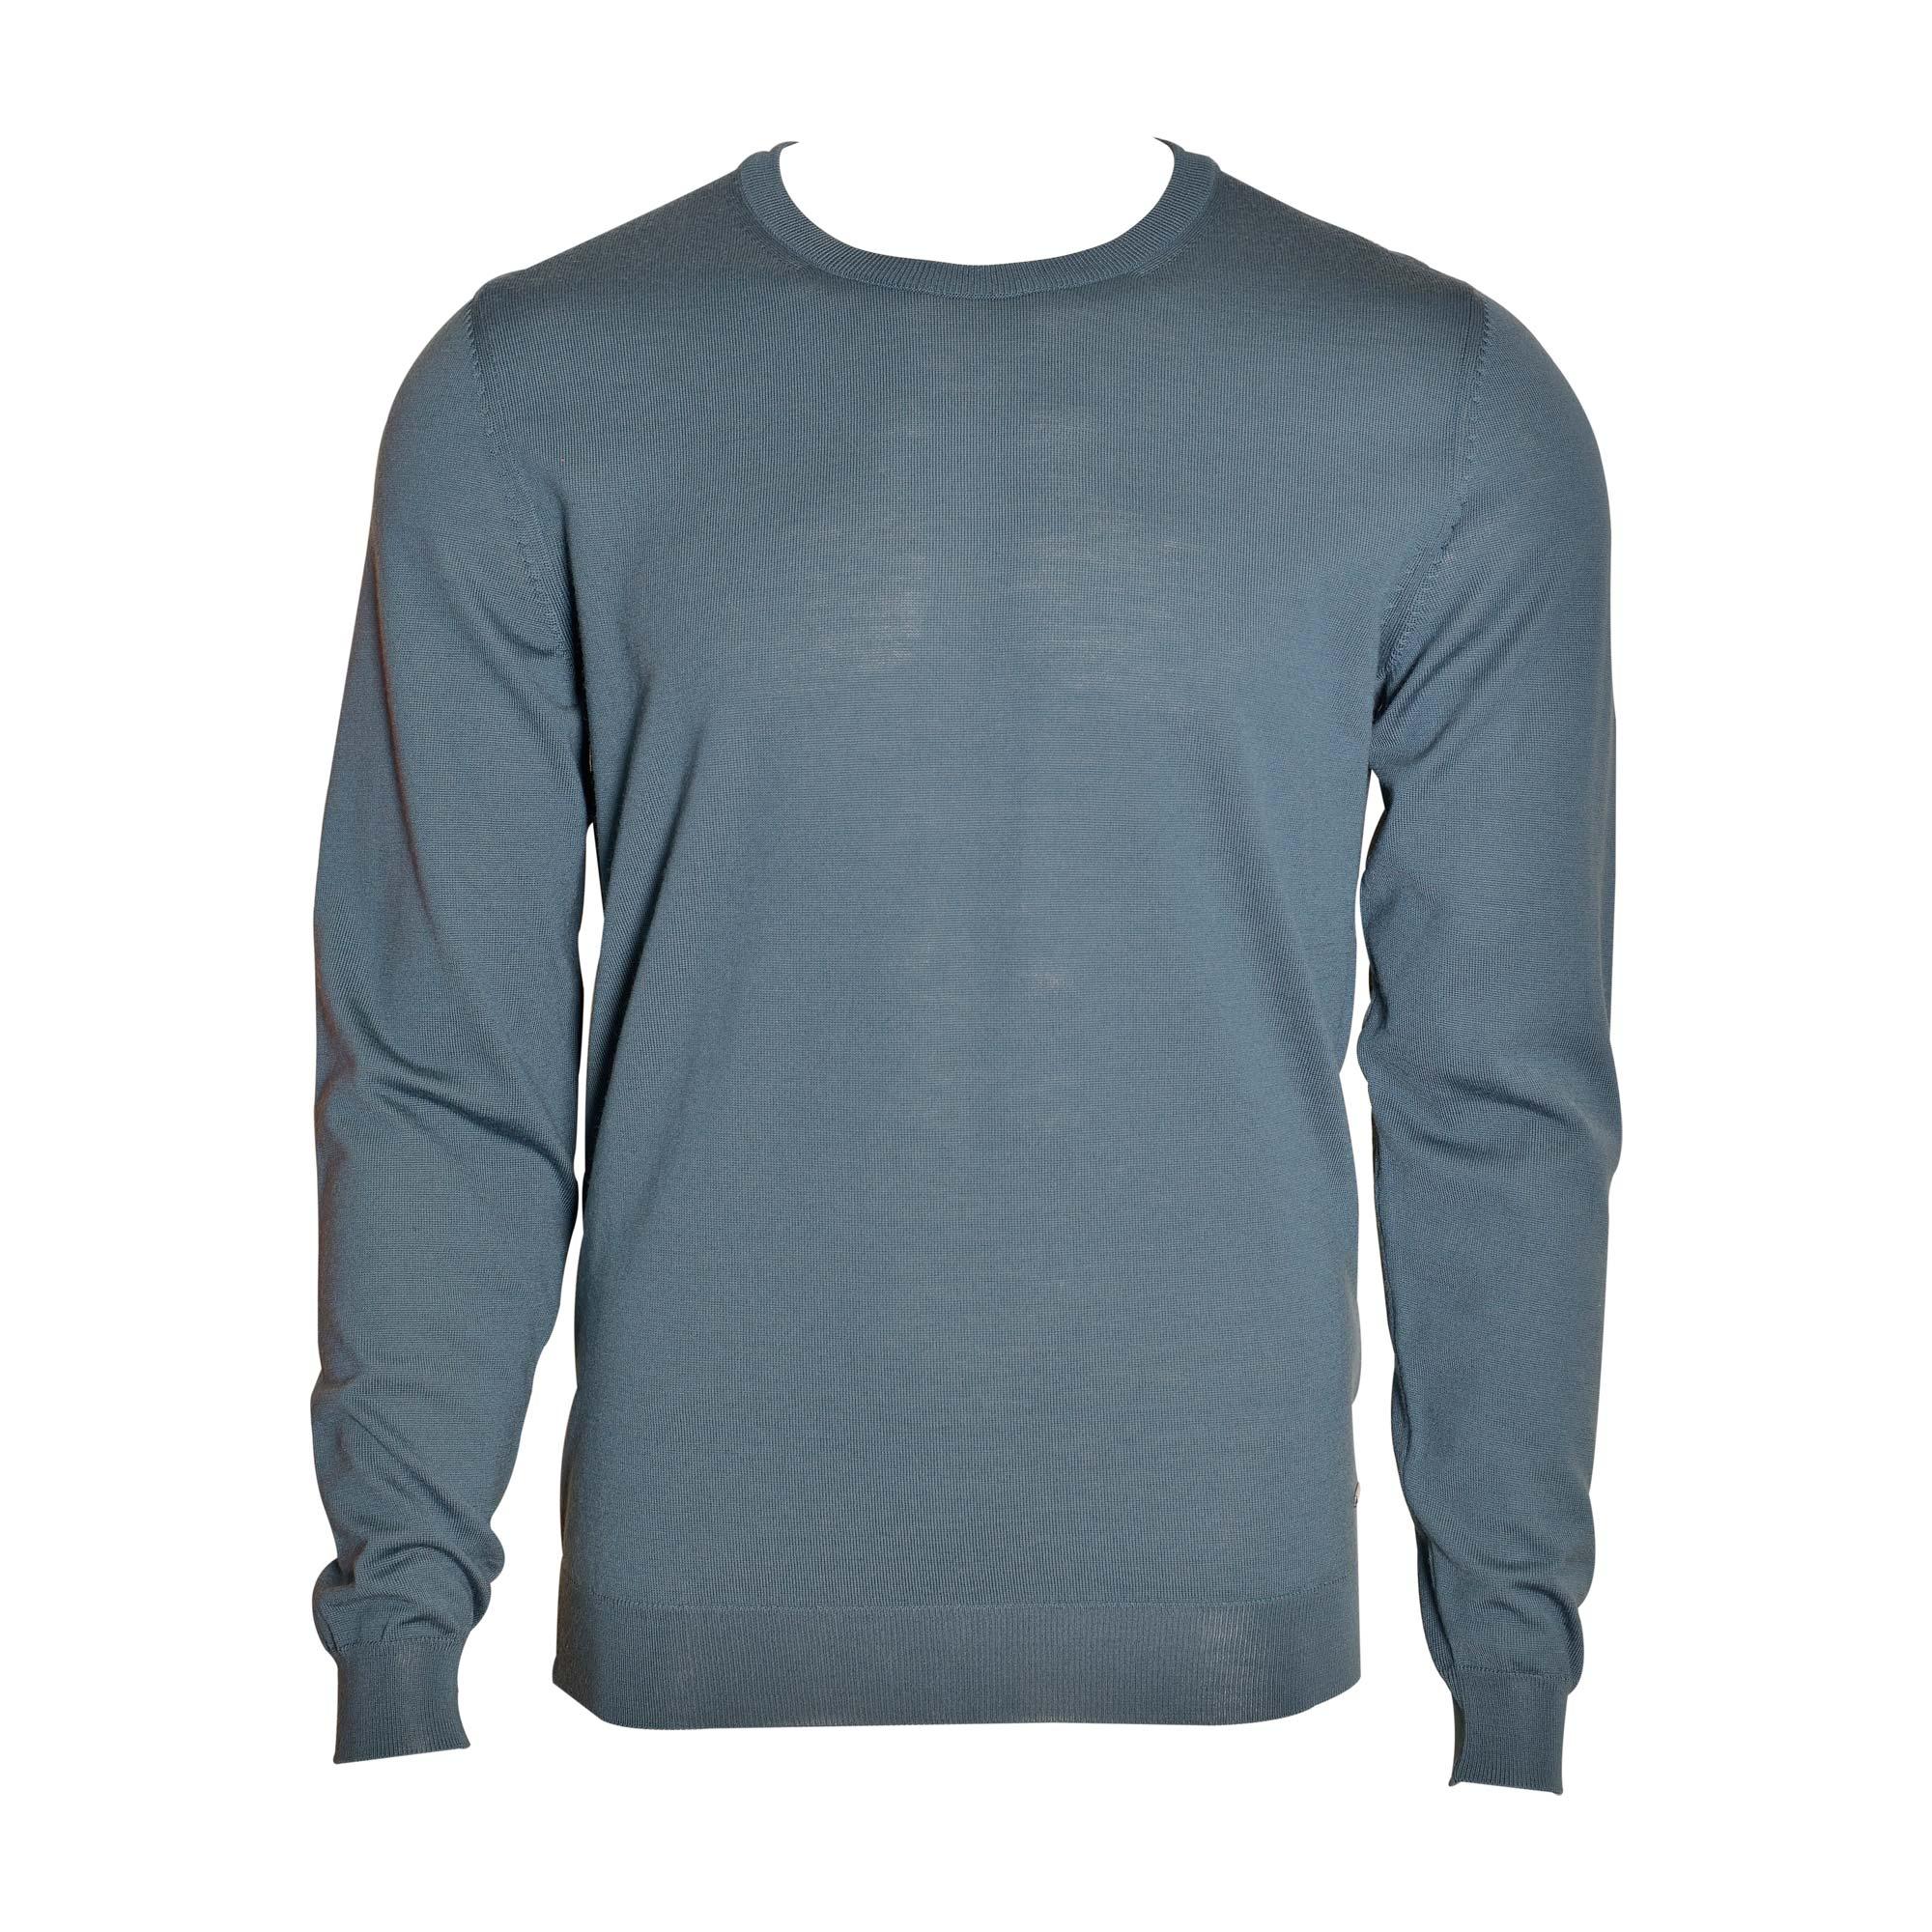 Pull HUGO BOSS 2 (M) bleu vendu par Dress-code 75 - 6888481 59f9f950b59